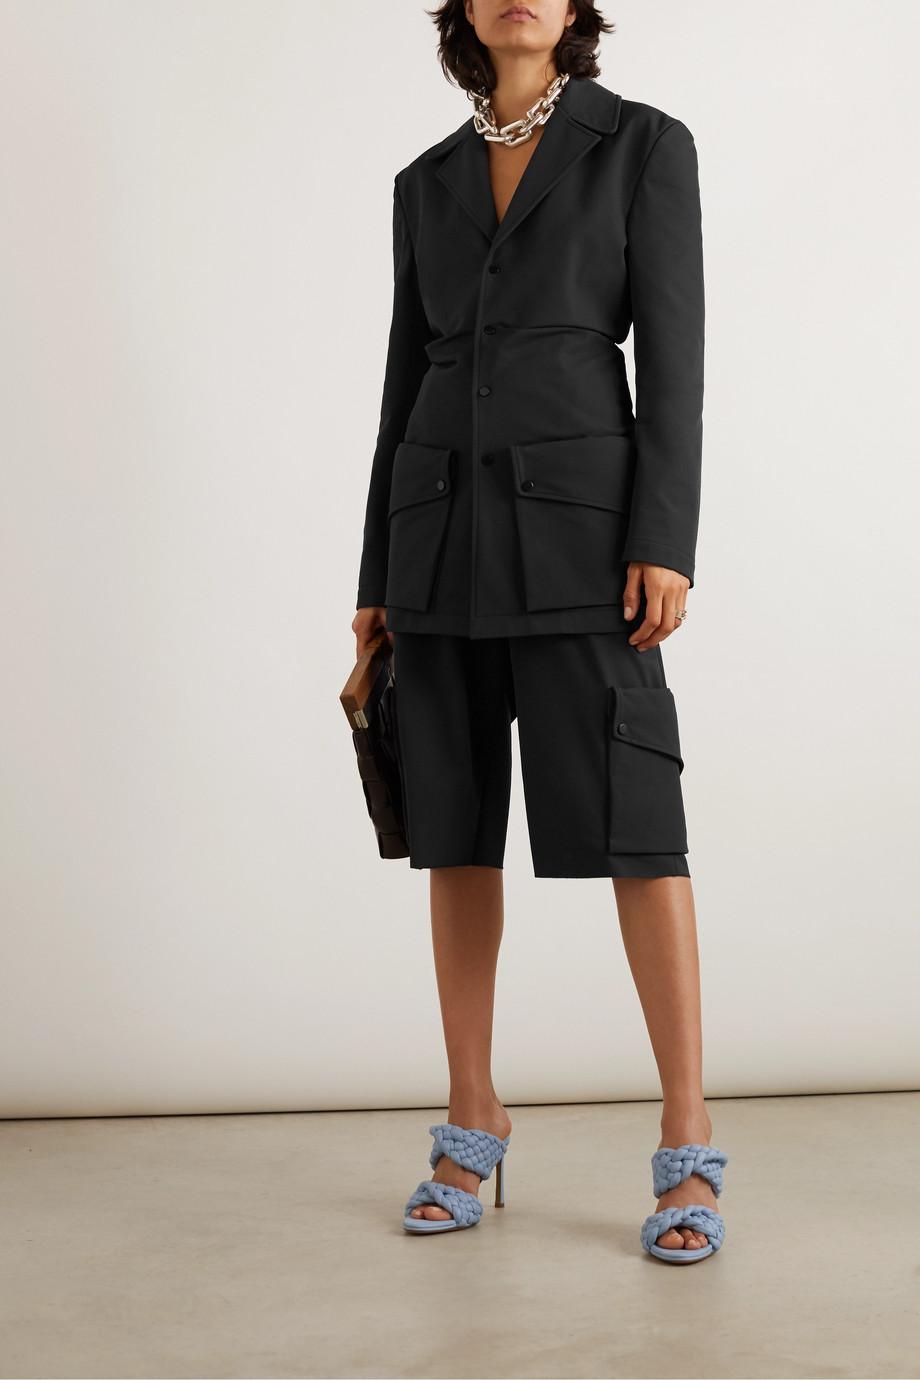 Bottega Veneta 弹力斜纹布西装外套